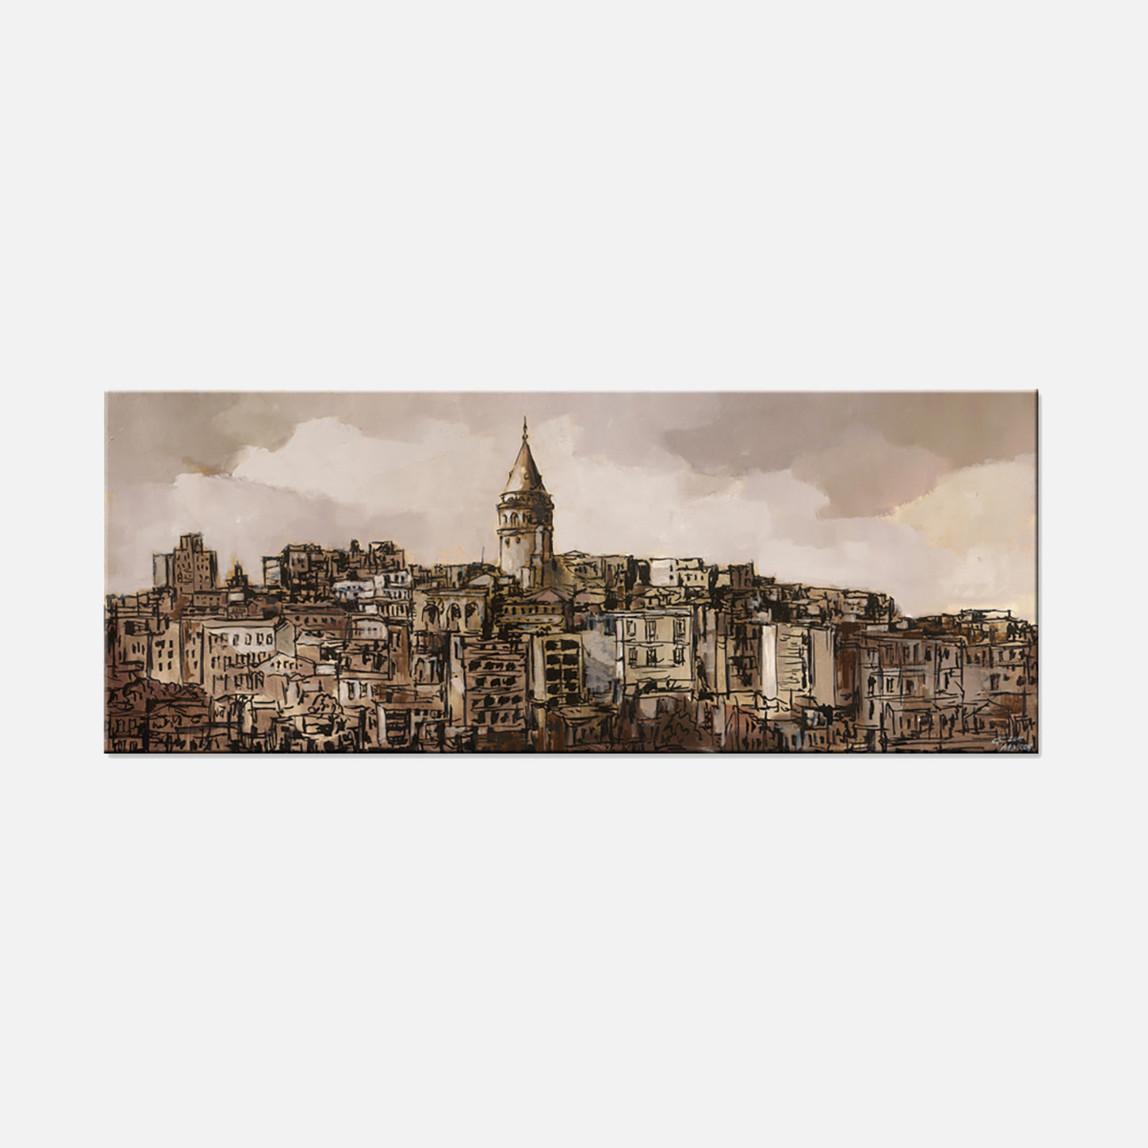 Dec-Spec 40x100 cm Kanvas Tablo